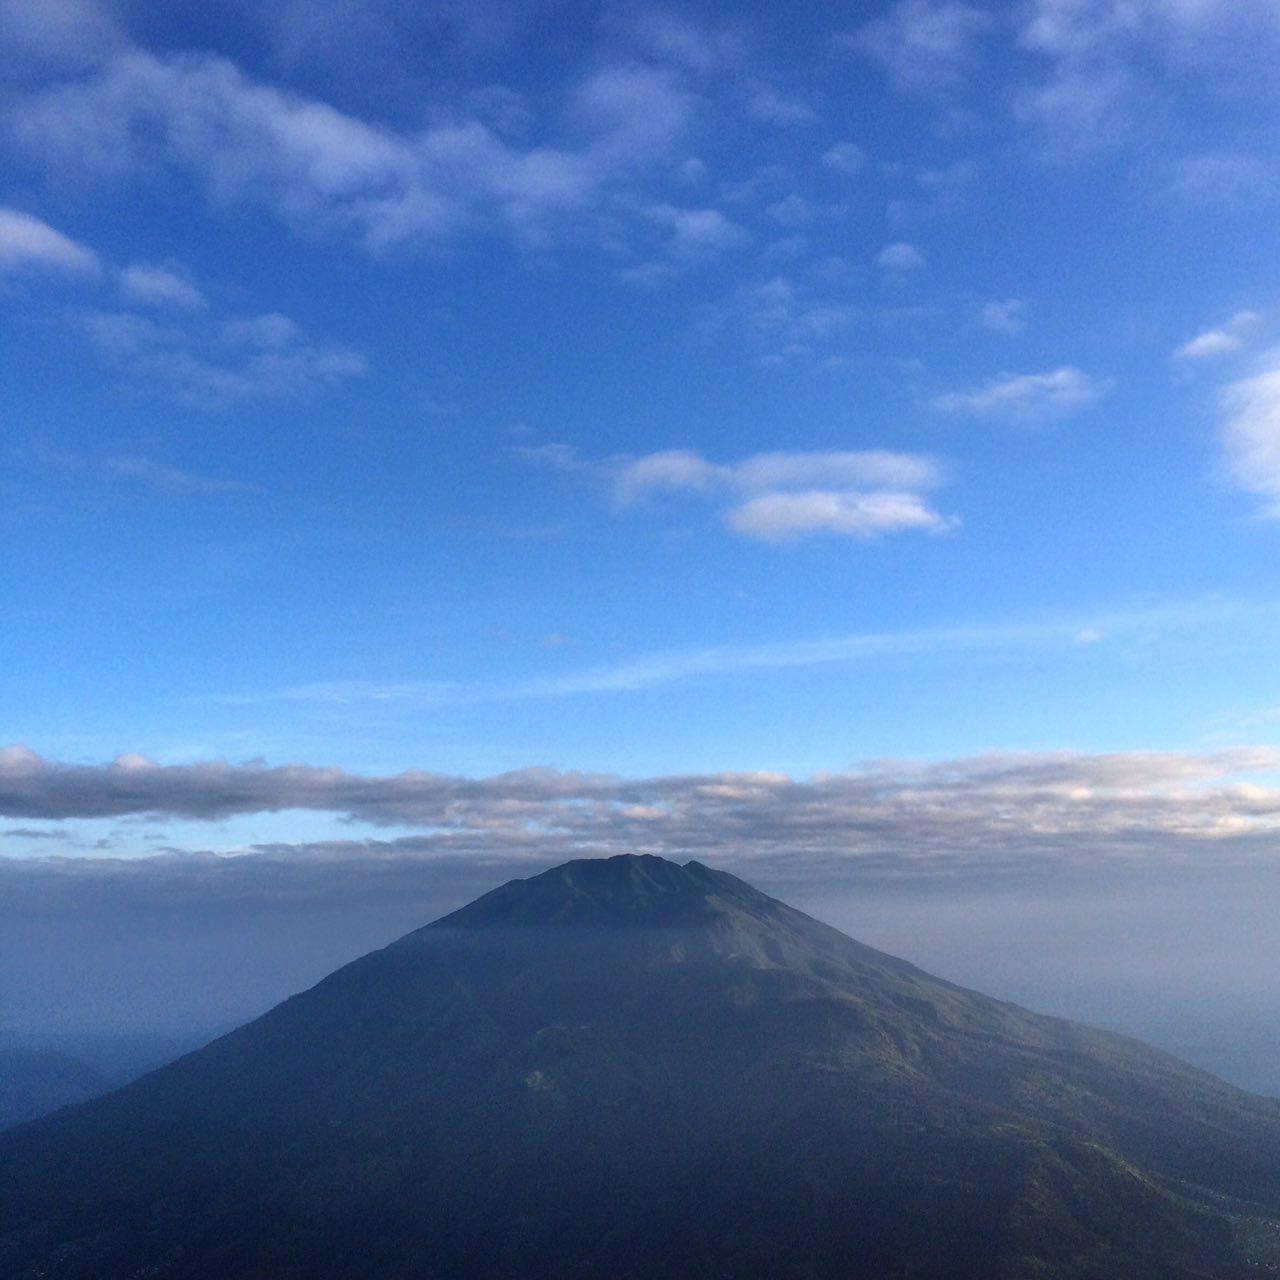 Mount Merbabu as seen from Mount Merapi's Pasar Bubrah